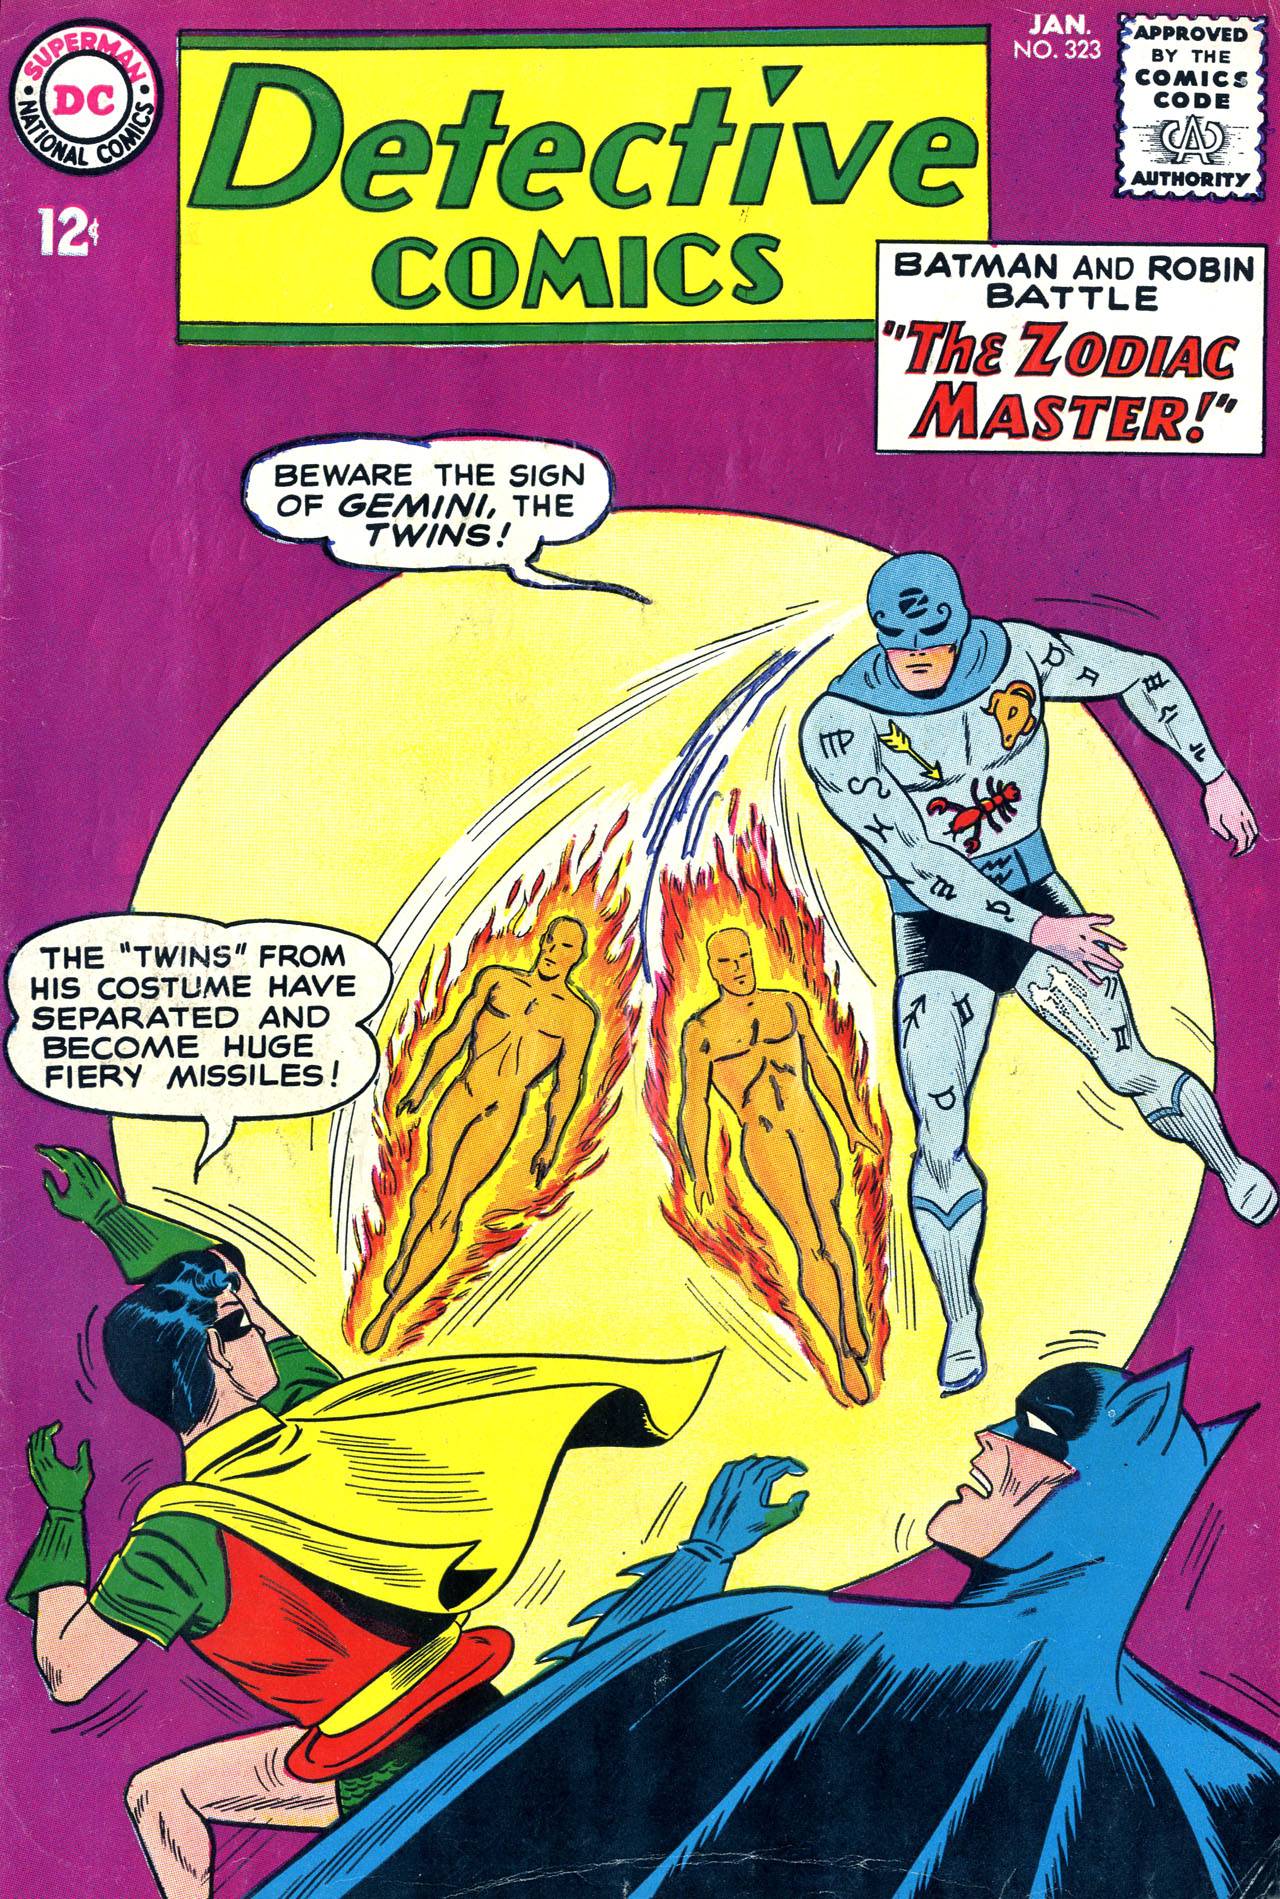 Detective Comics (1937) 323 Page 1